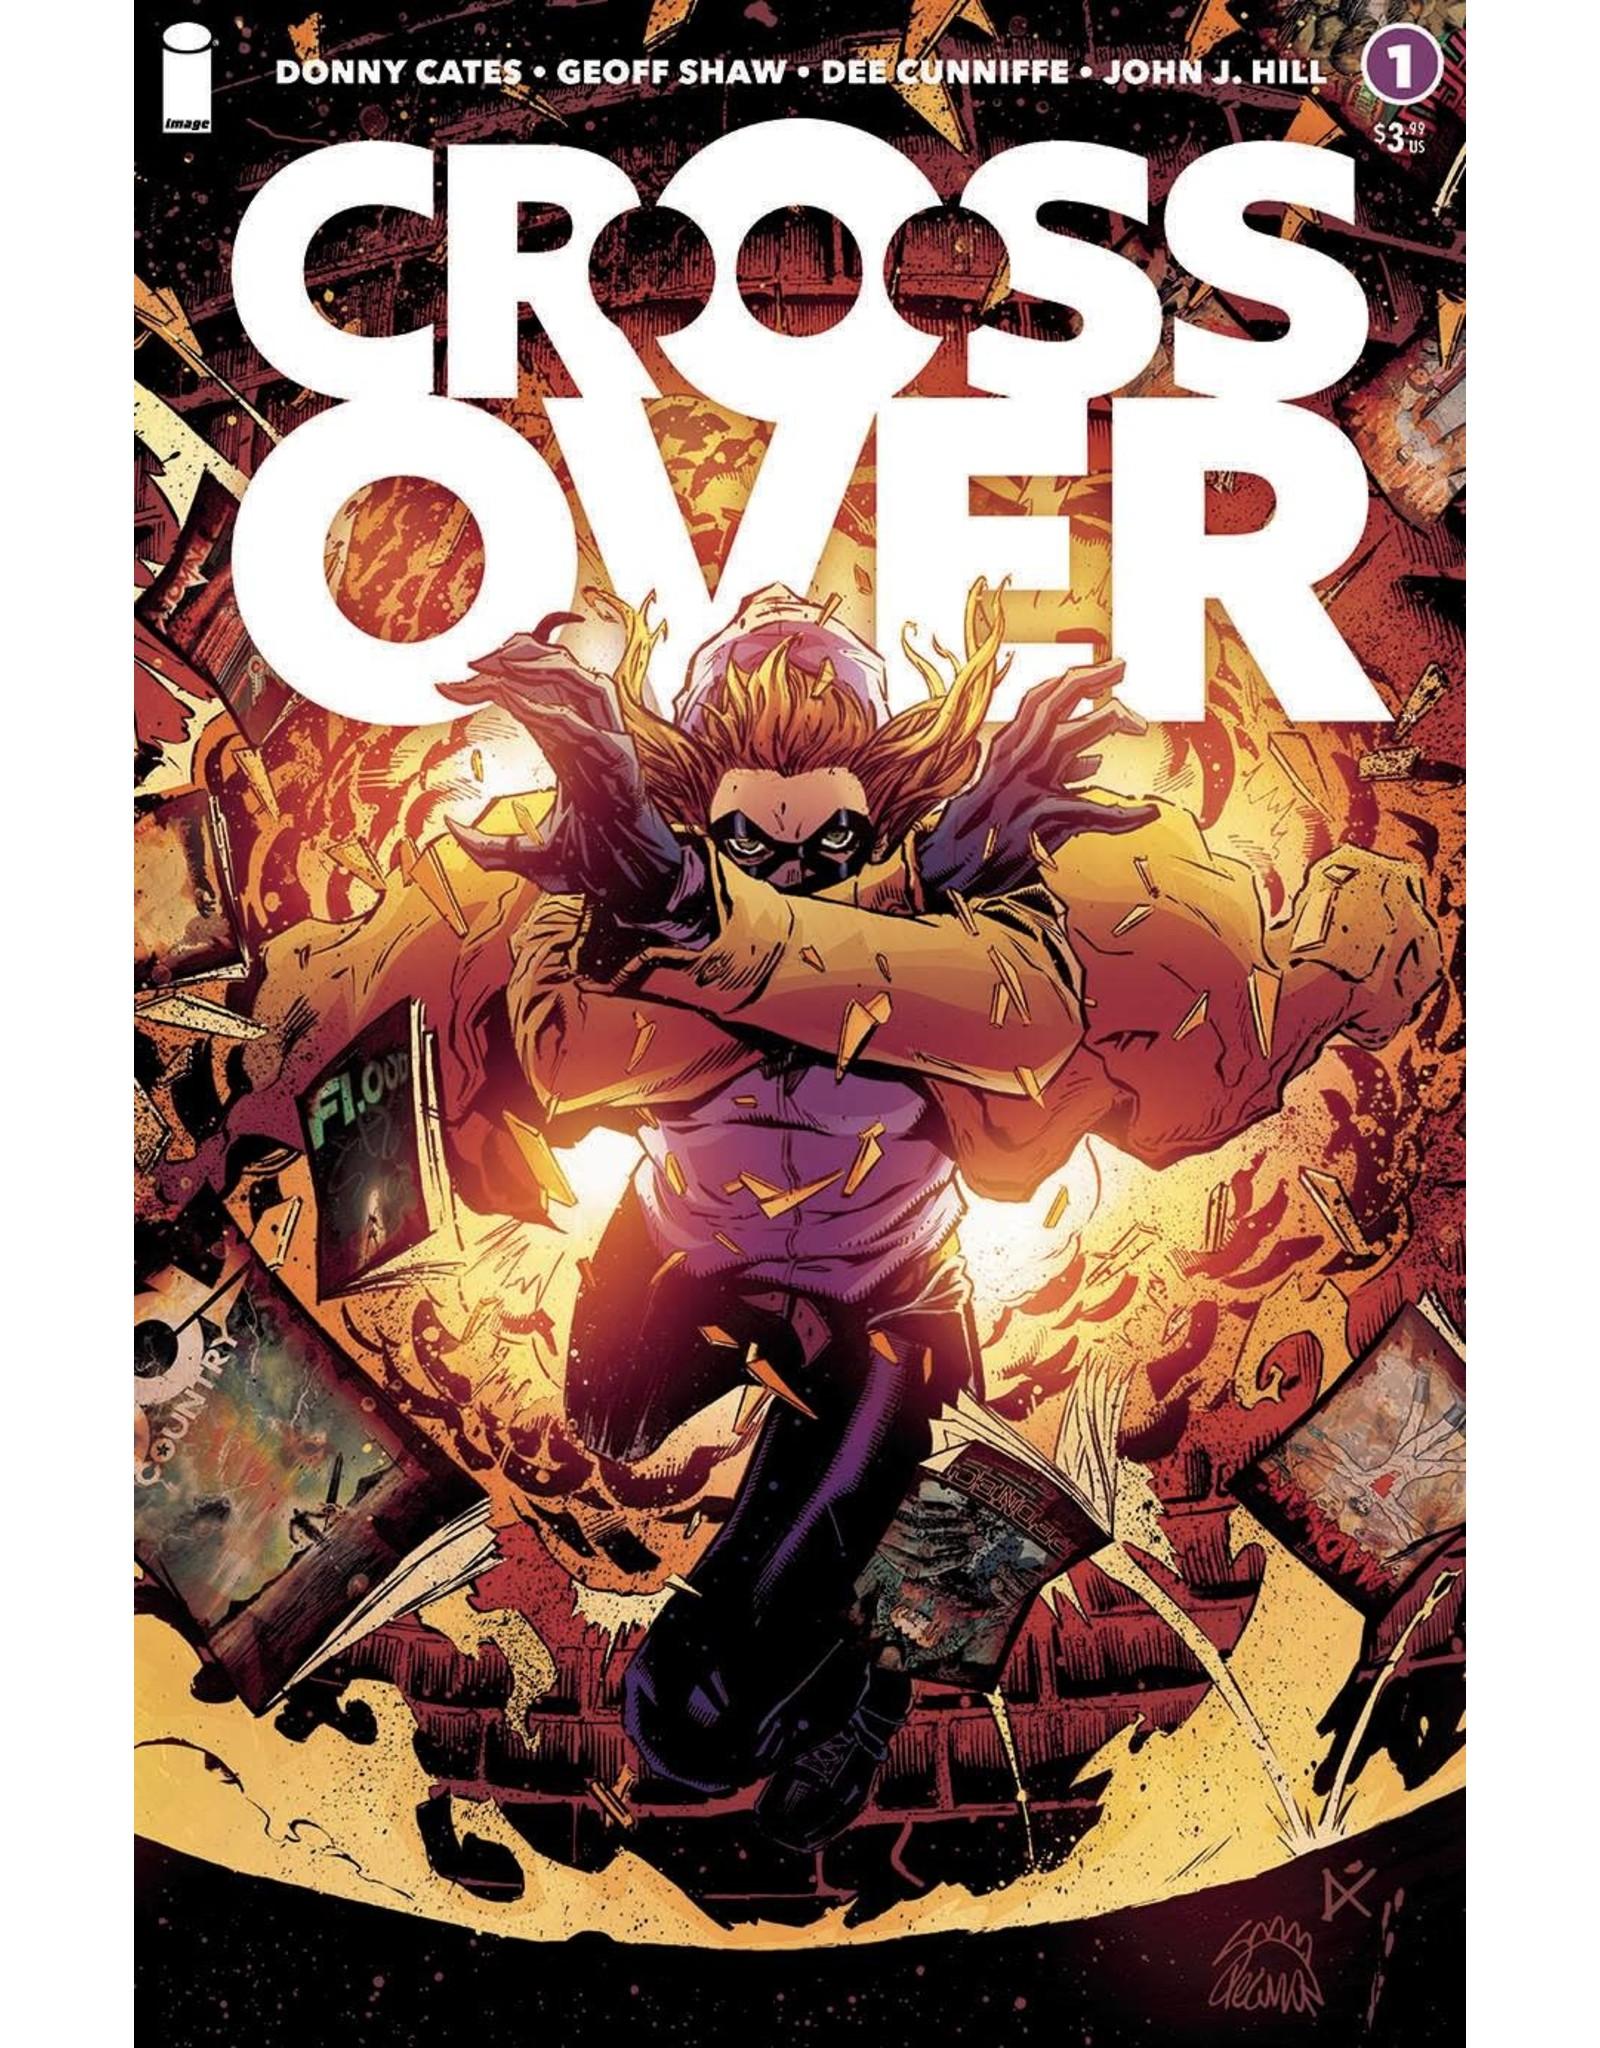 Image Comics CROSSOVER #1 CVR B STEGMAN & CUNNIFFE